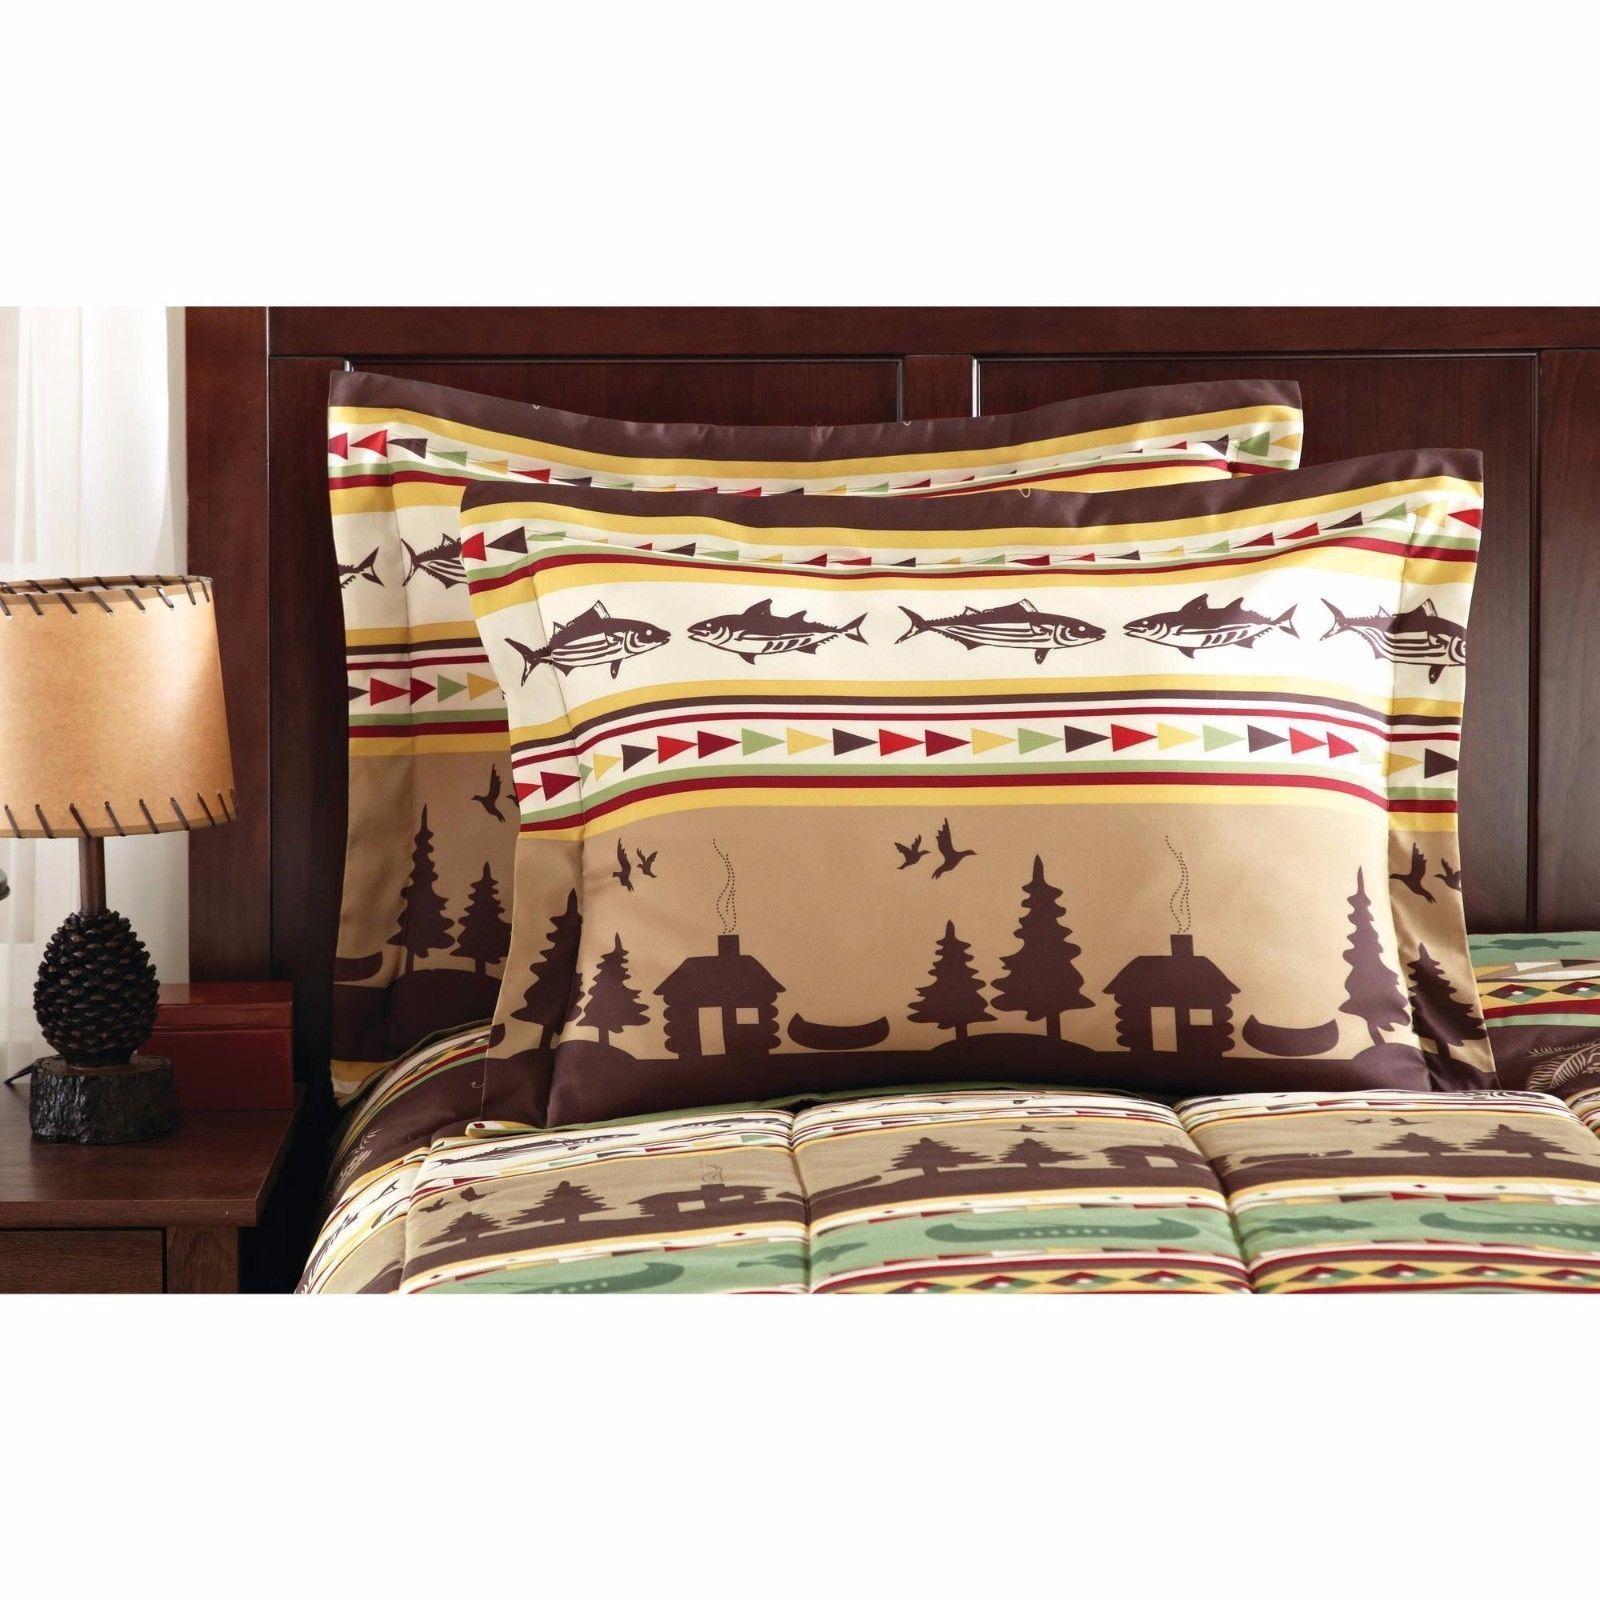 Lodge Bedding Sets In A Bag